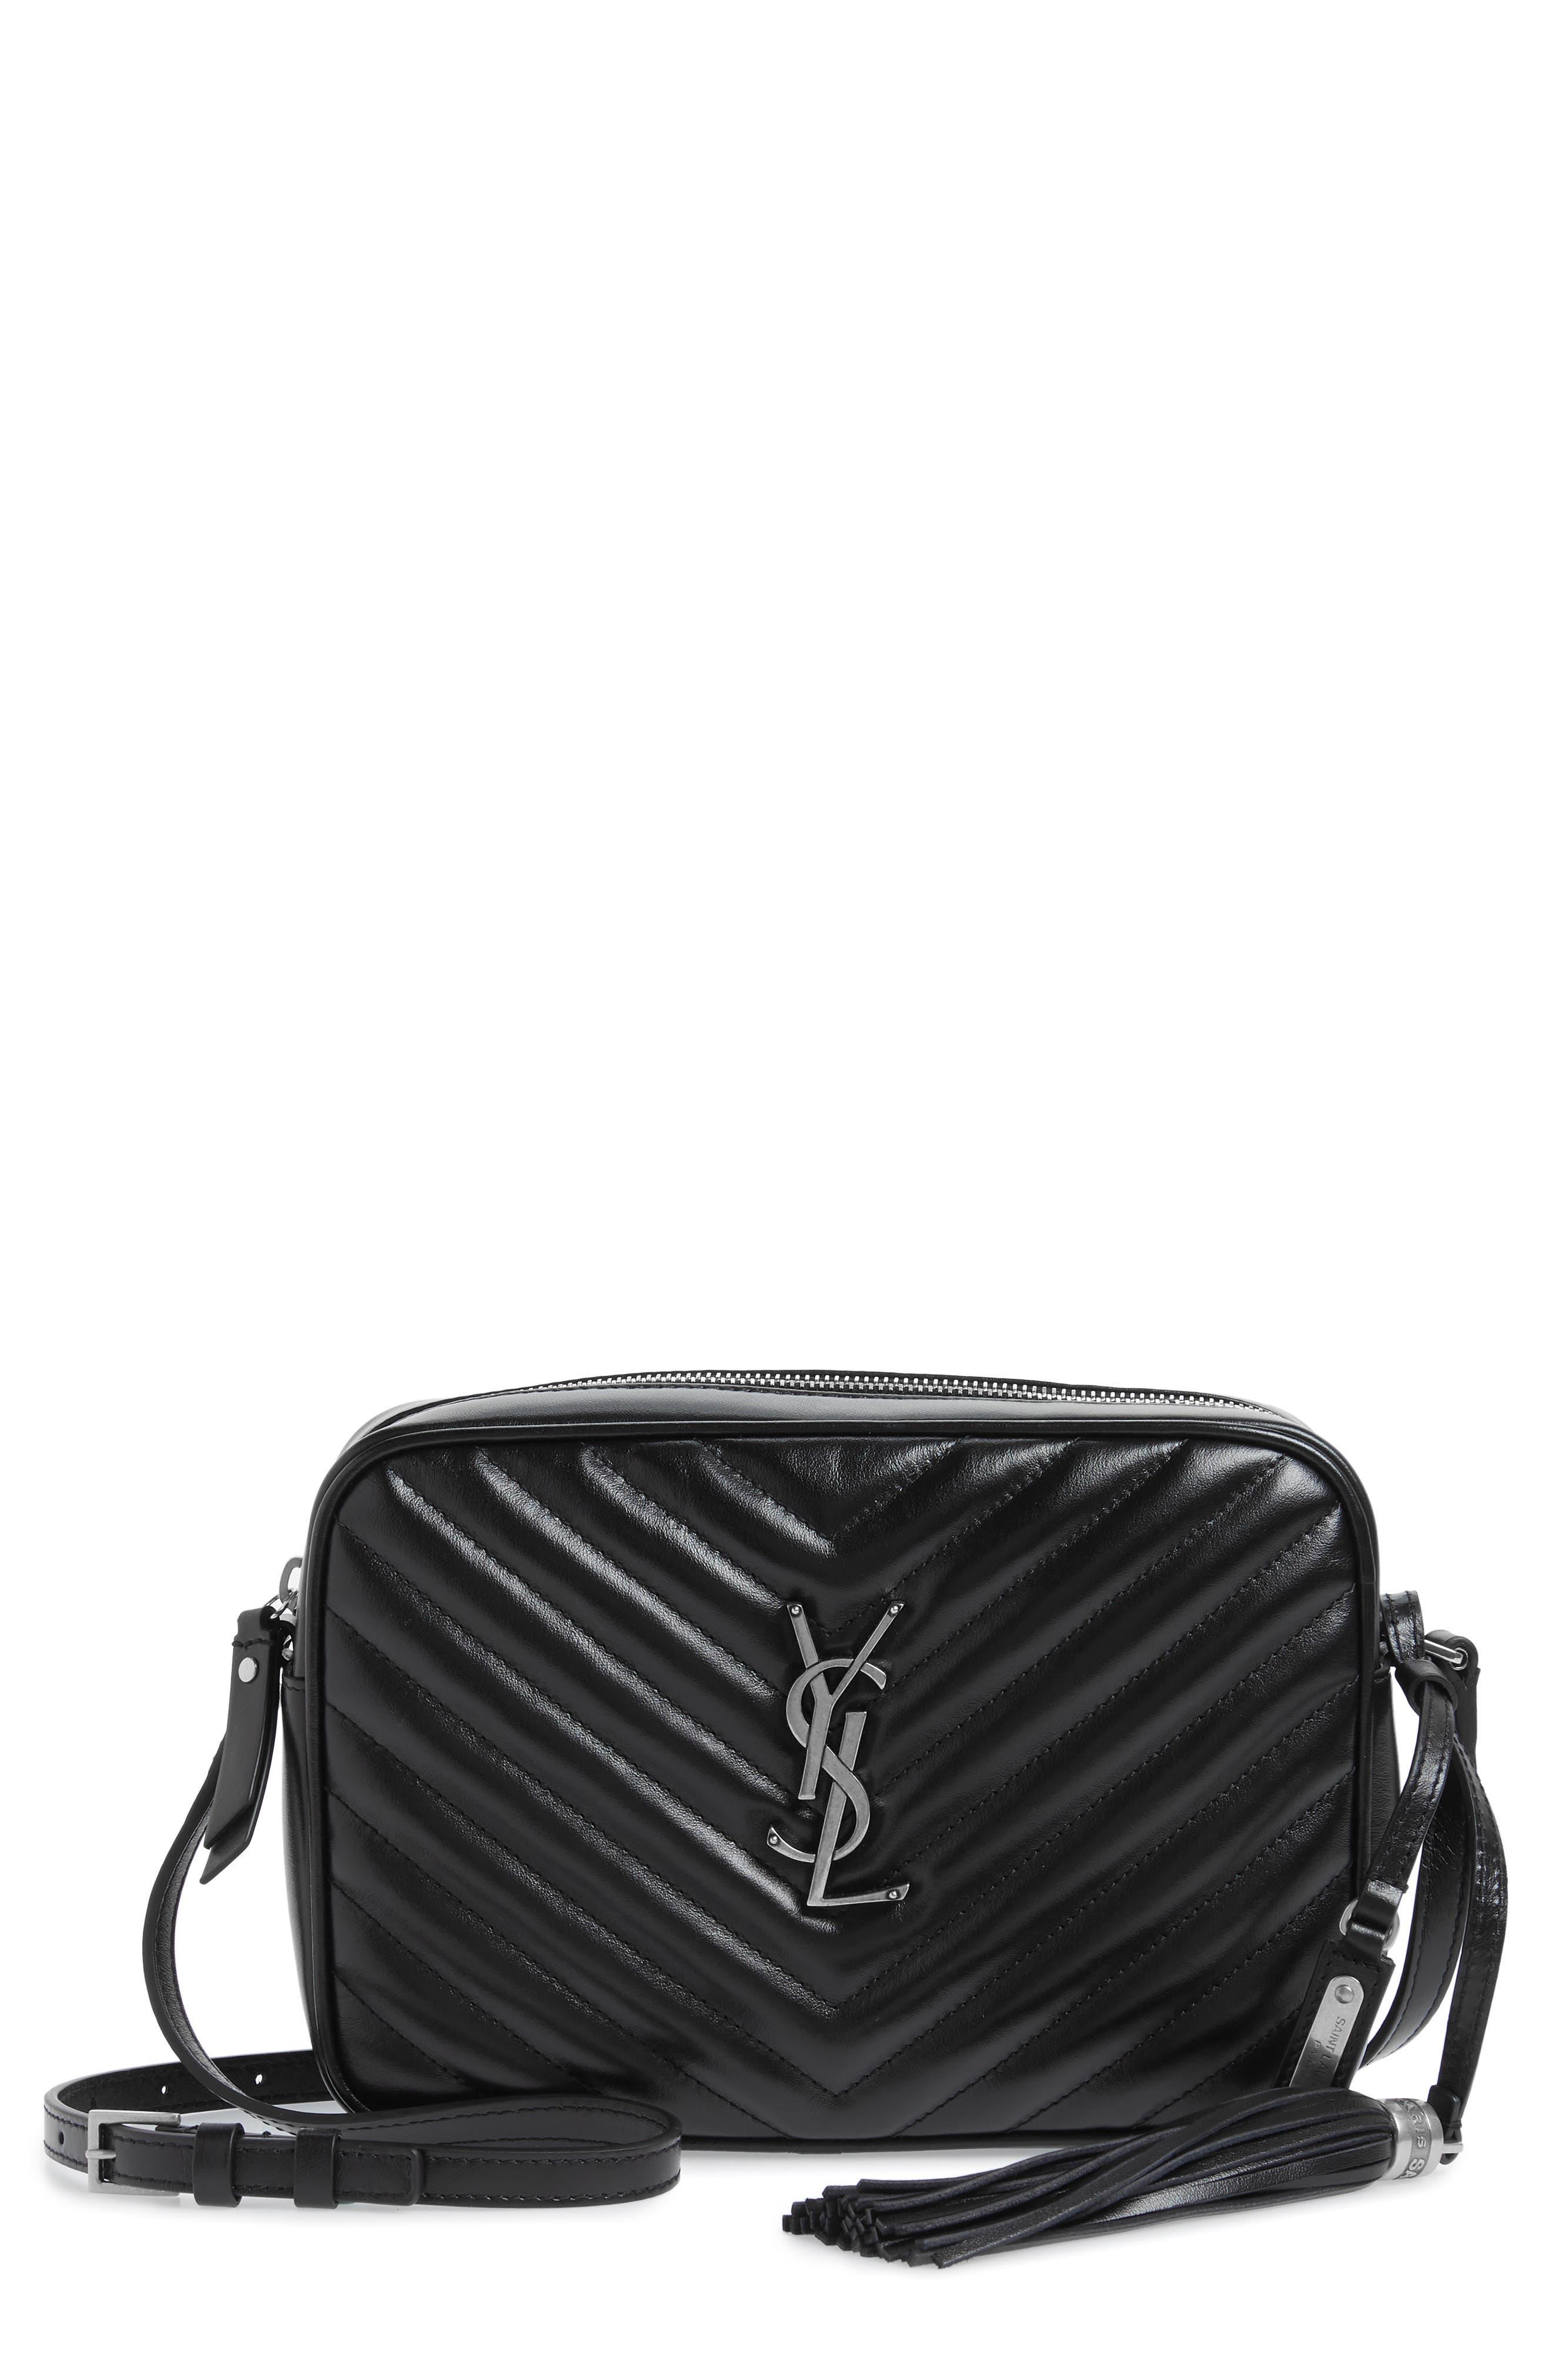 Medium Lou Calfskin Leather Camera Bag,                         Main,                         color, 001